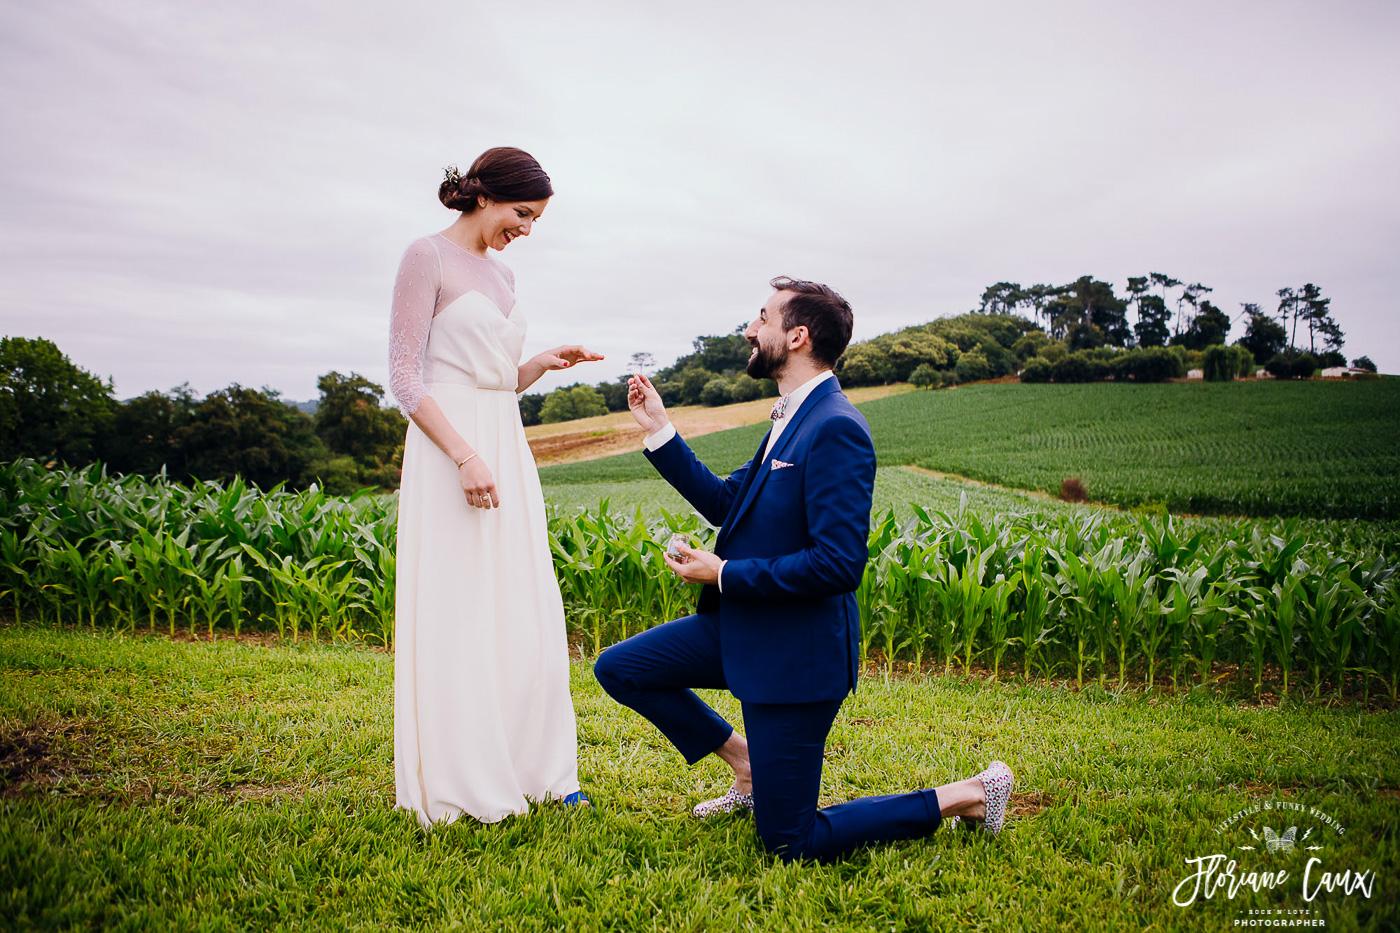 photographe-mariage-pays-basque-Floriane-Caux (36)